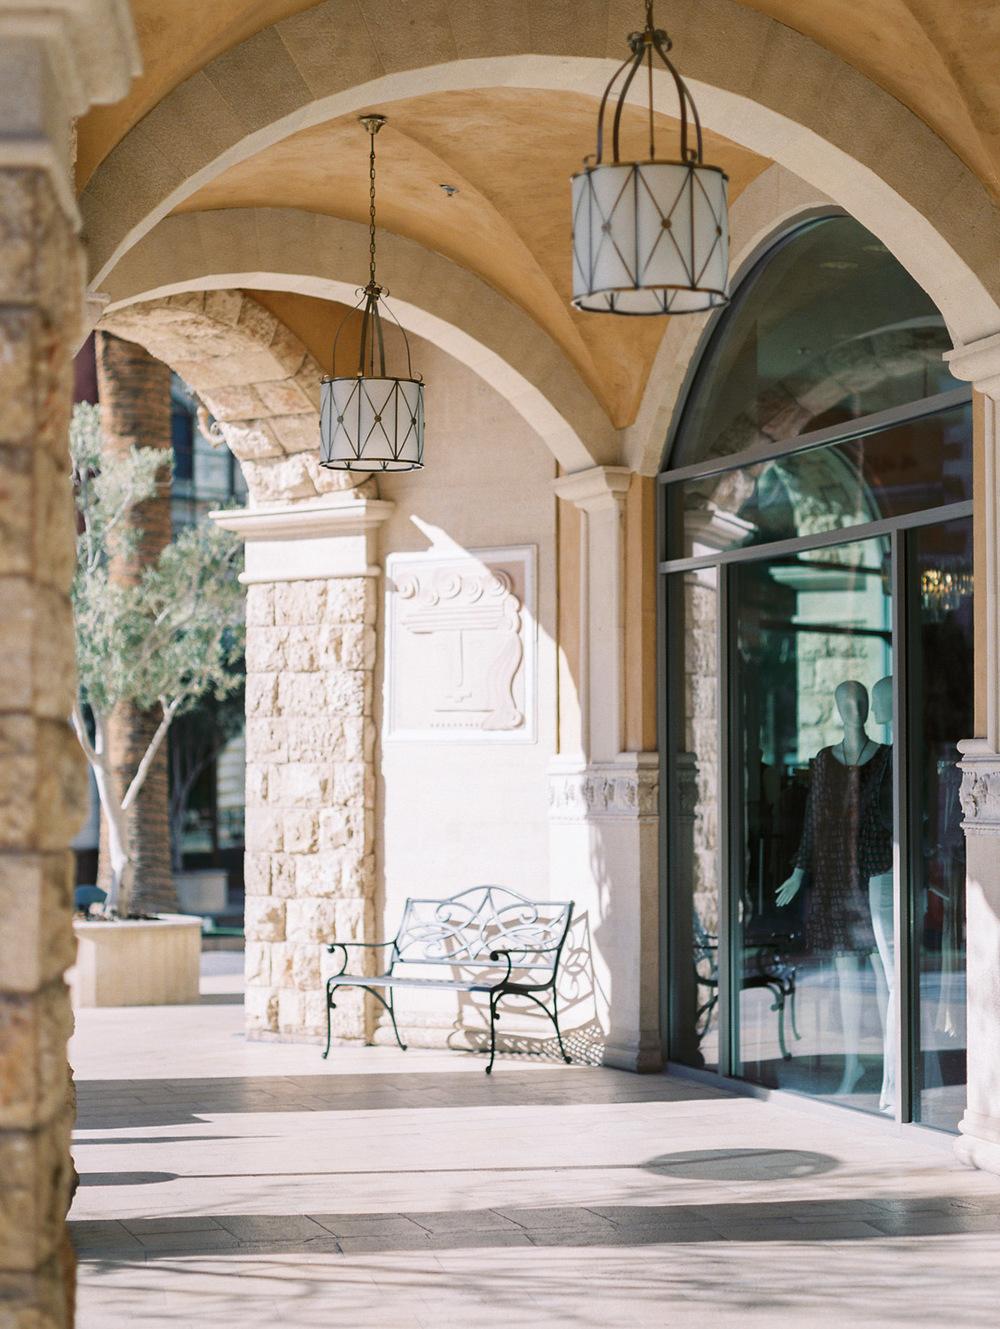 Las Vegas Nevada | Coffee Shop Engagement | Leoné Café | Tivoli Village | Kelsey & Nate | kelseyandnate.com